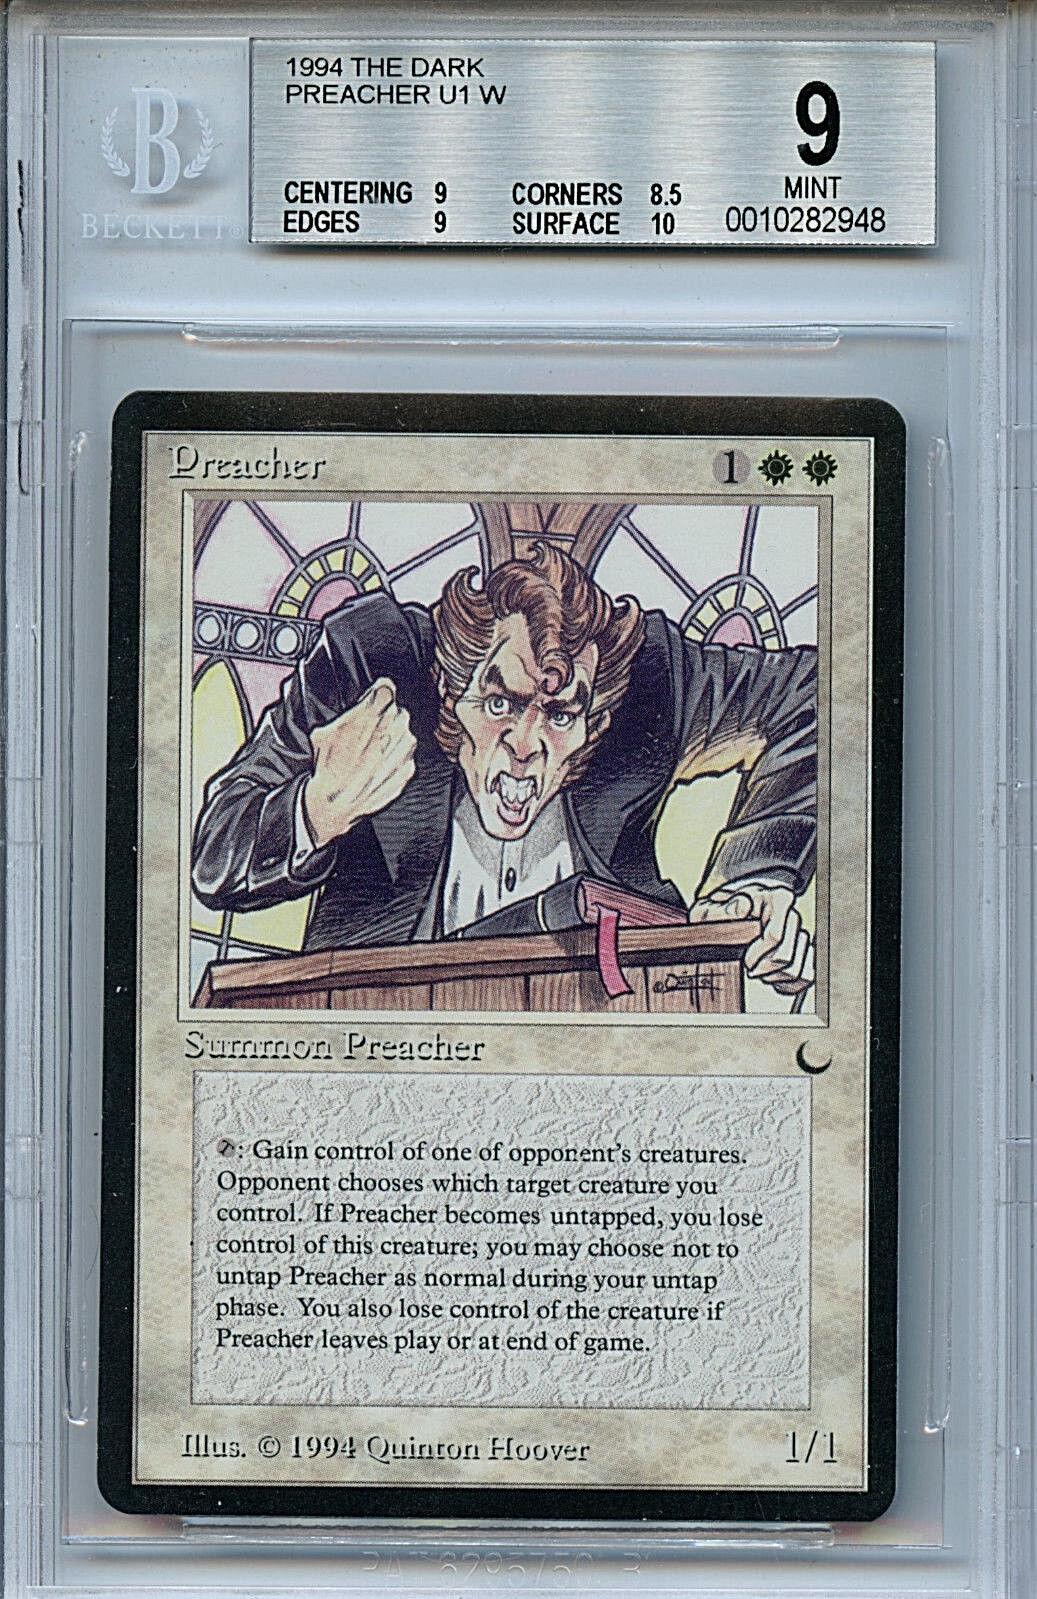 Mtg dunkle protiger bgs 9,0 (9) - karte wotc 2948 magie